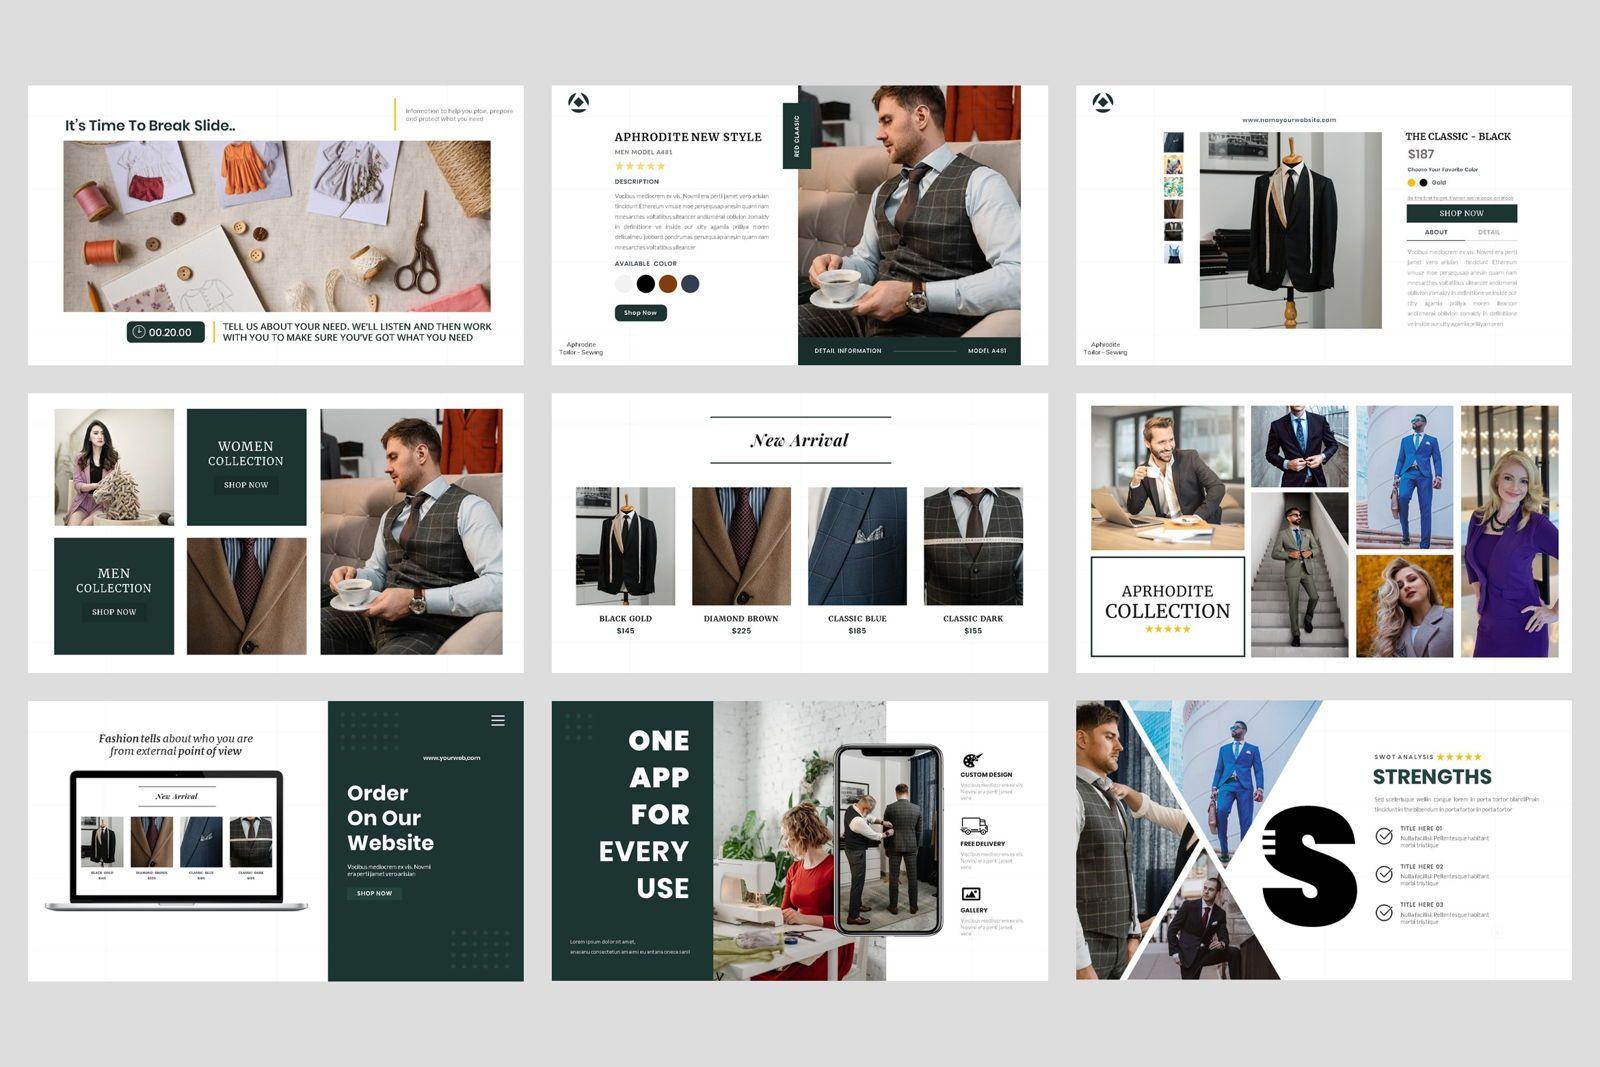 Tailor - Sewing Fashion Craft Keynote Template, Slide 4, 08633, Business Models — PoweredTemplate.com